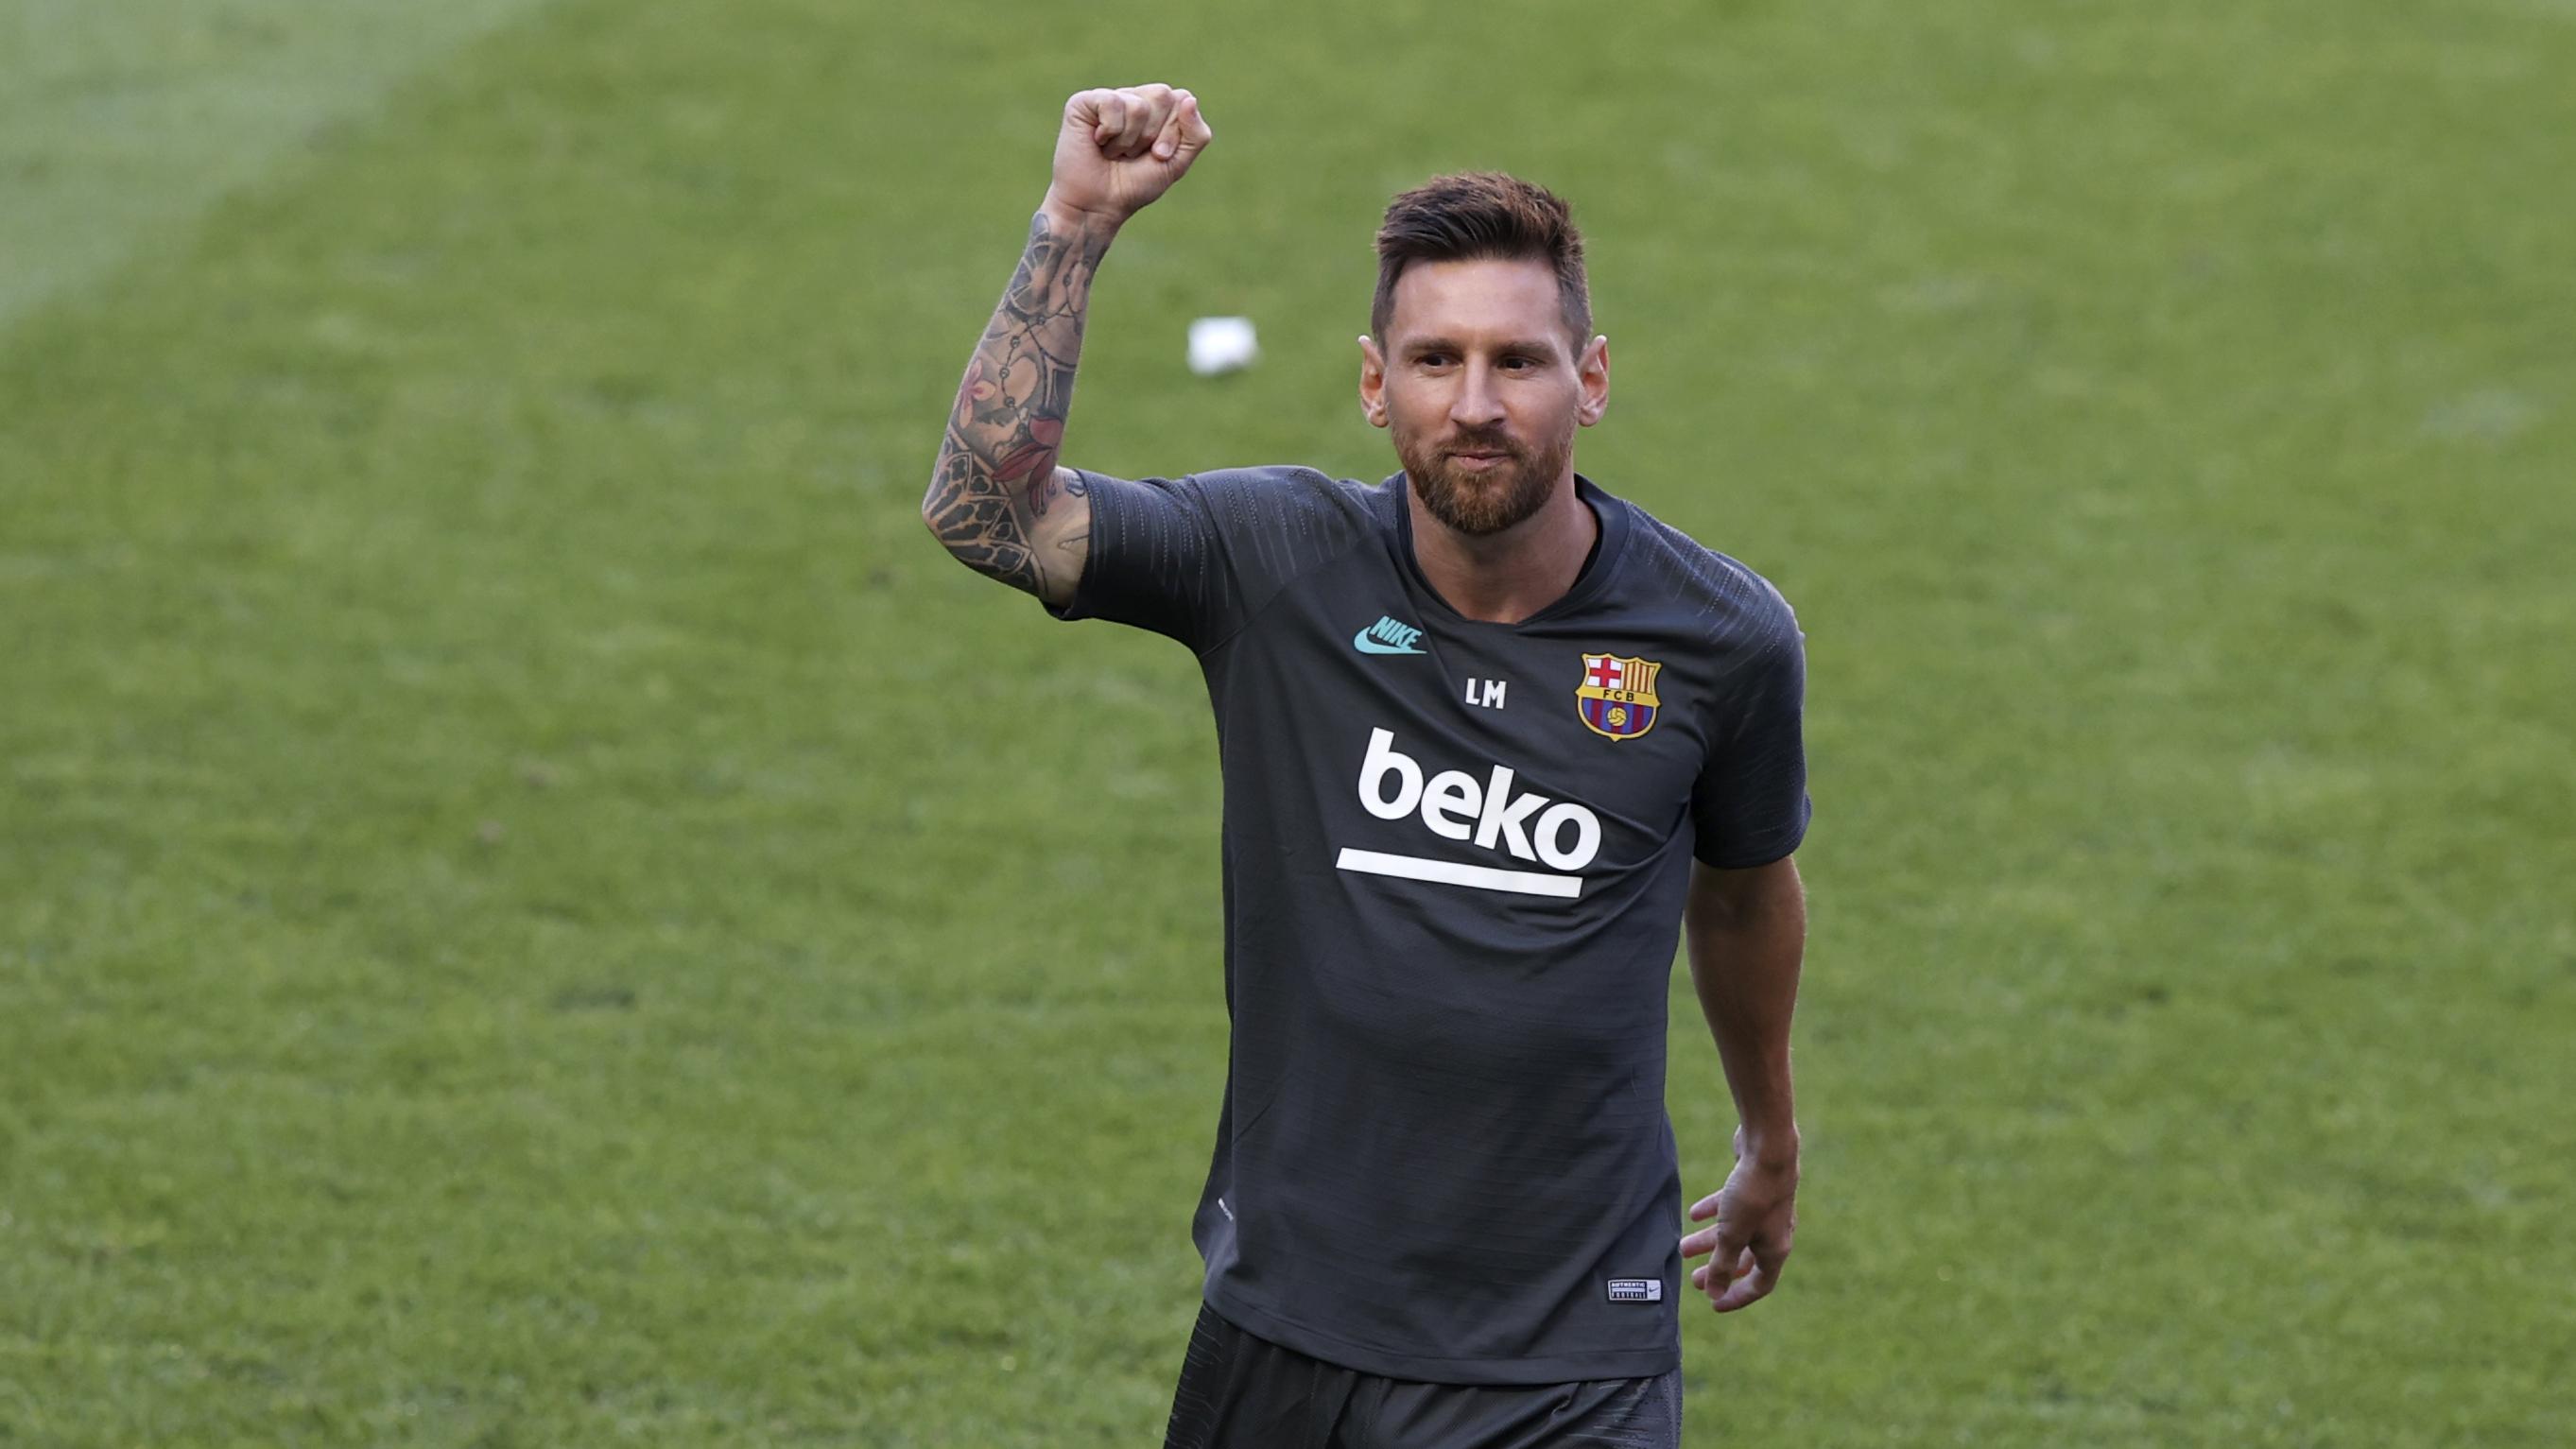 Fc Barcelona Vs Bayern Munich Live Stream Start Time Tv Channel How To Watch Champions League 2020 Fri Aug 14 Masslive Com